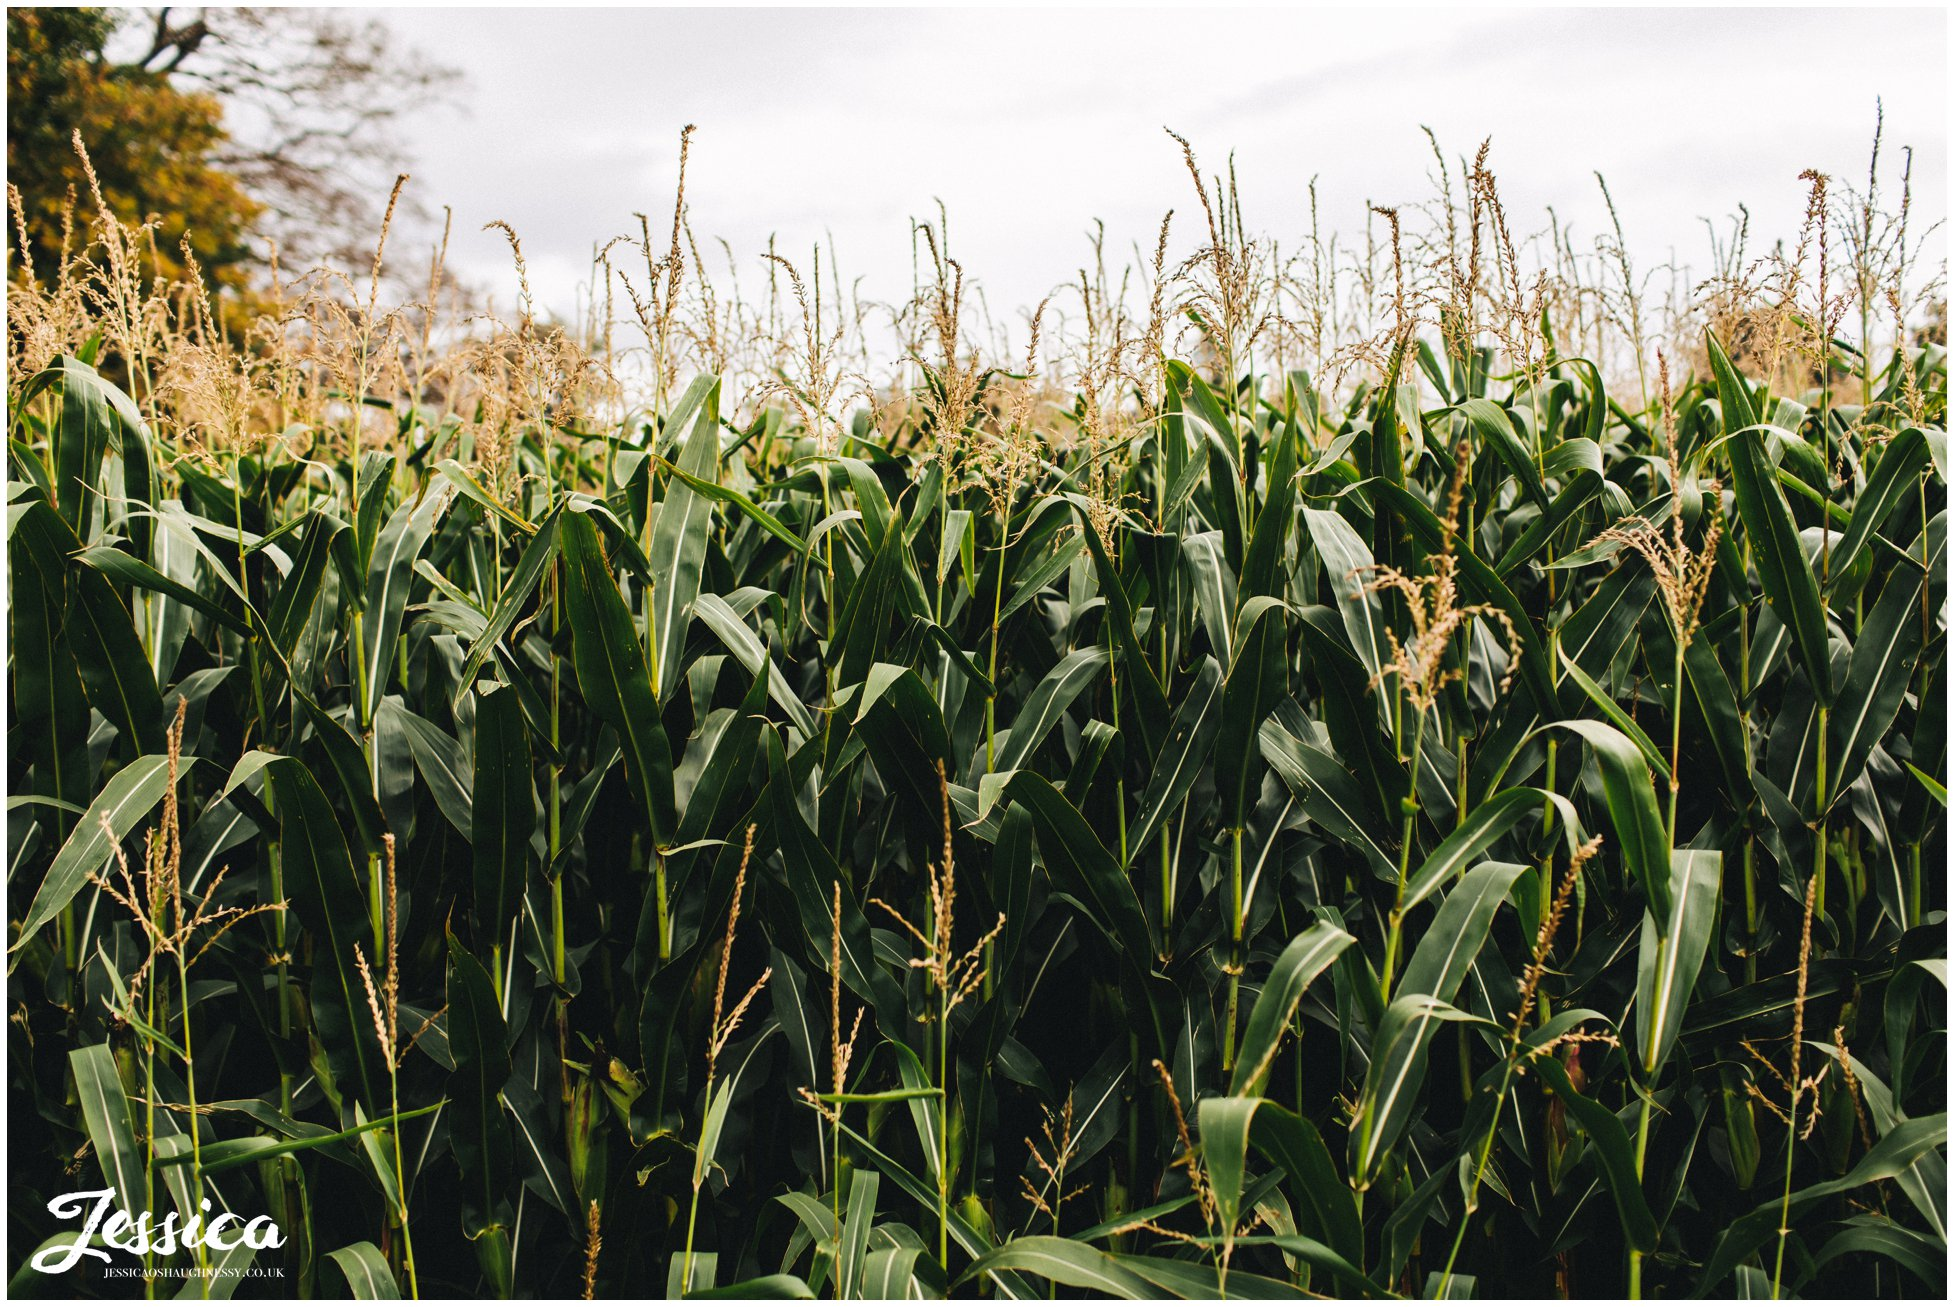 cornfields line the entrance to Llanrhaeadr Springs